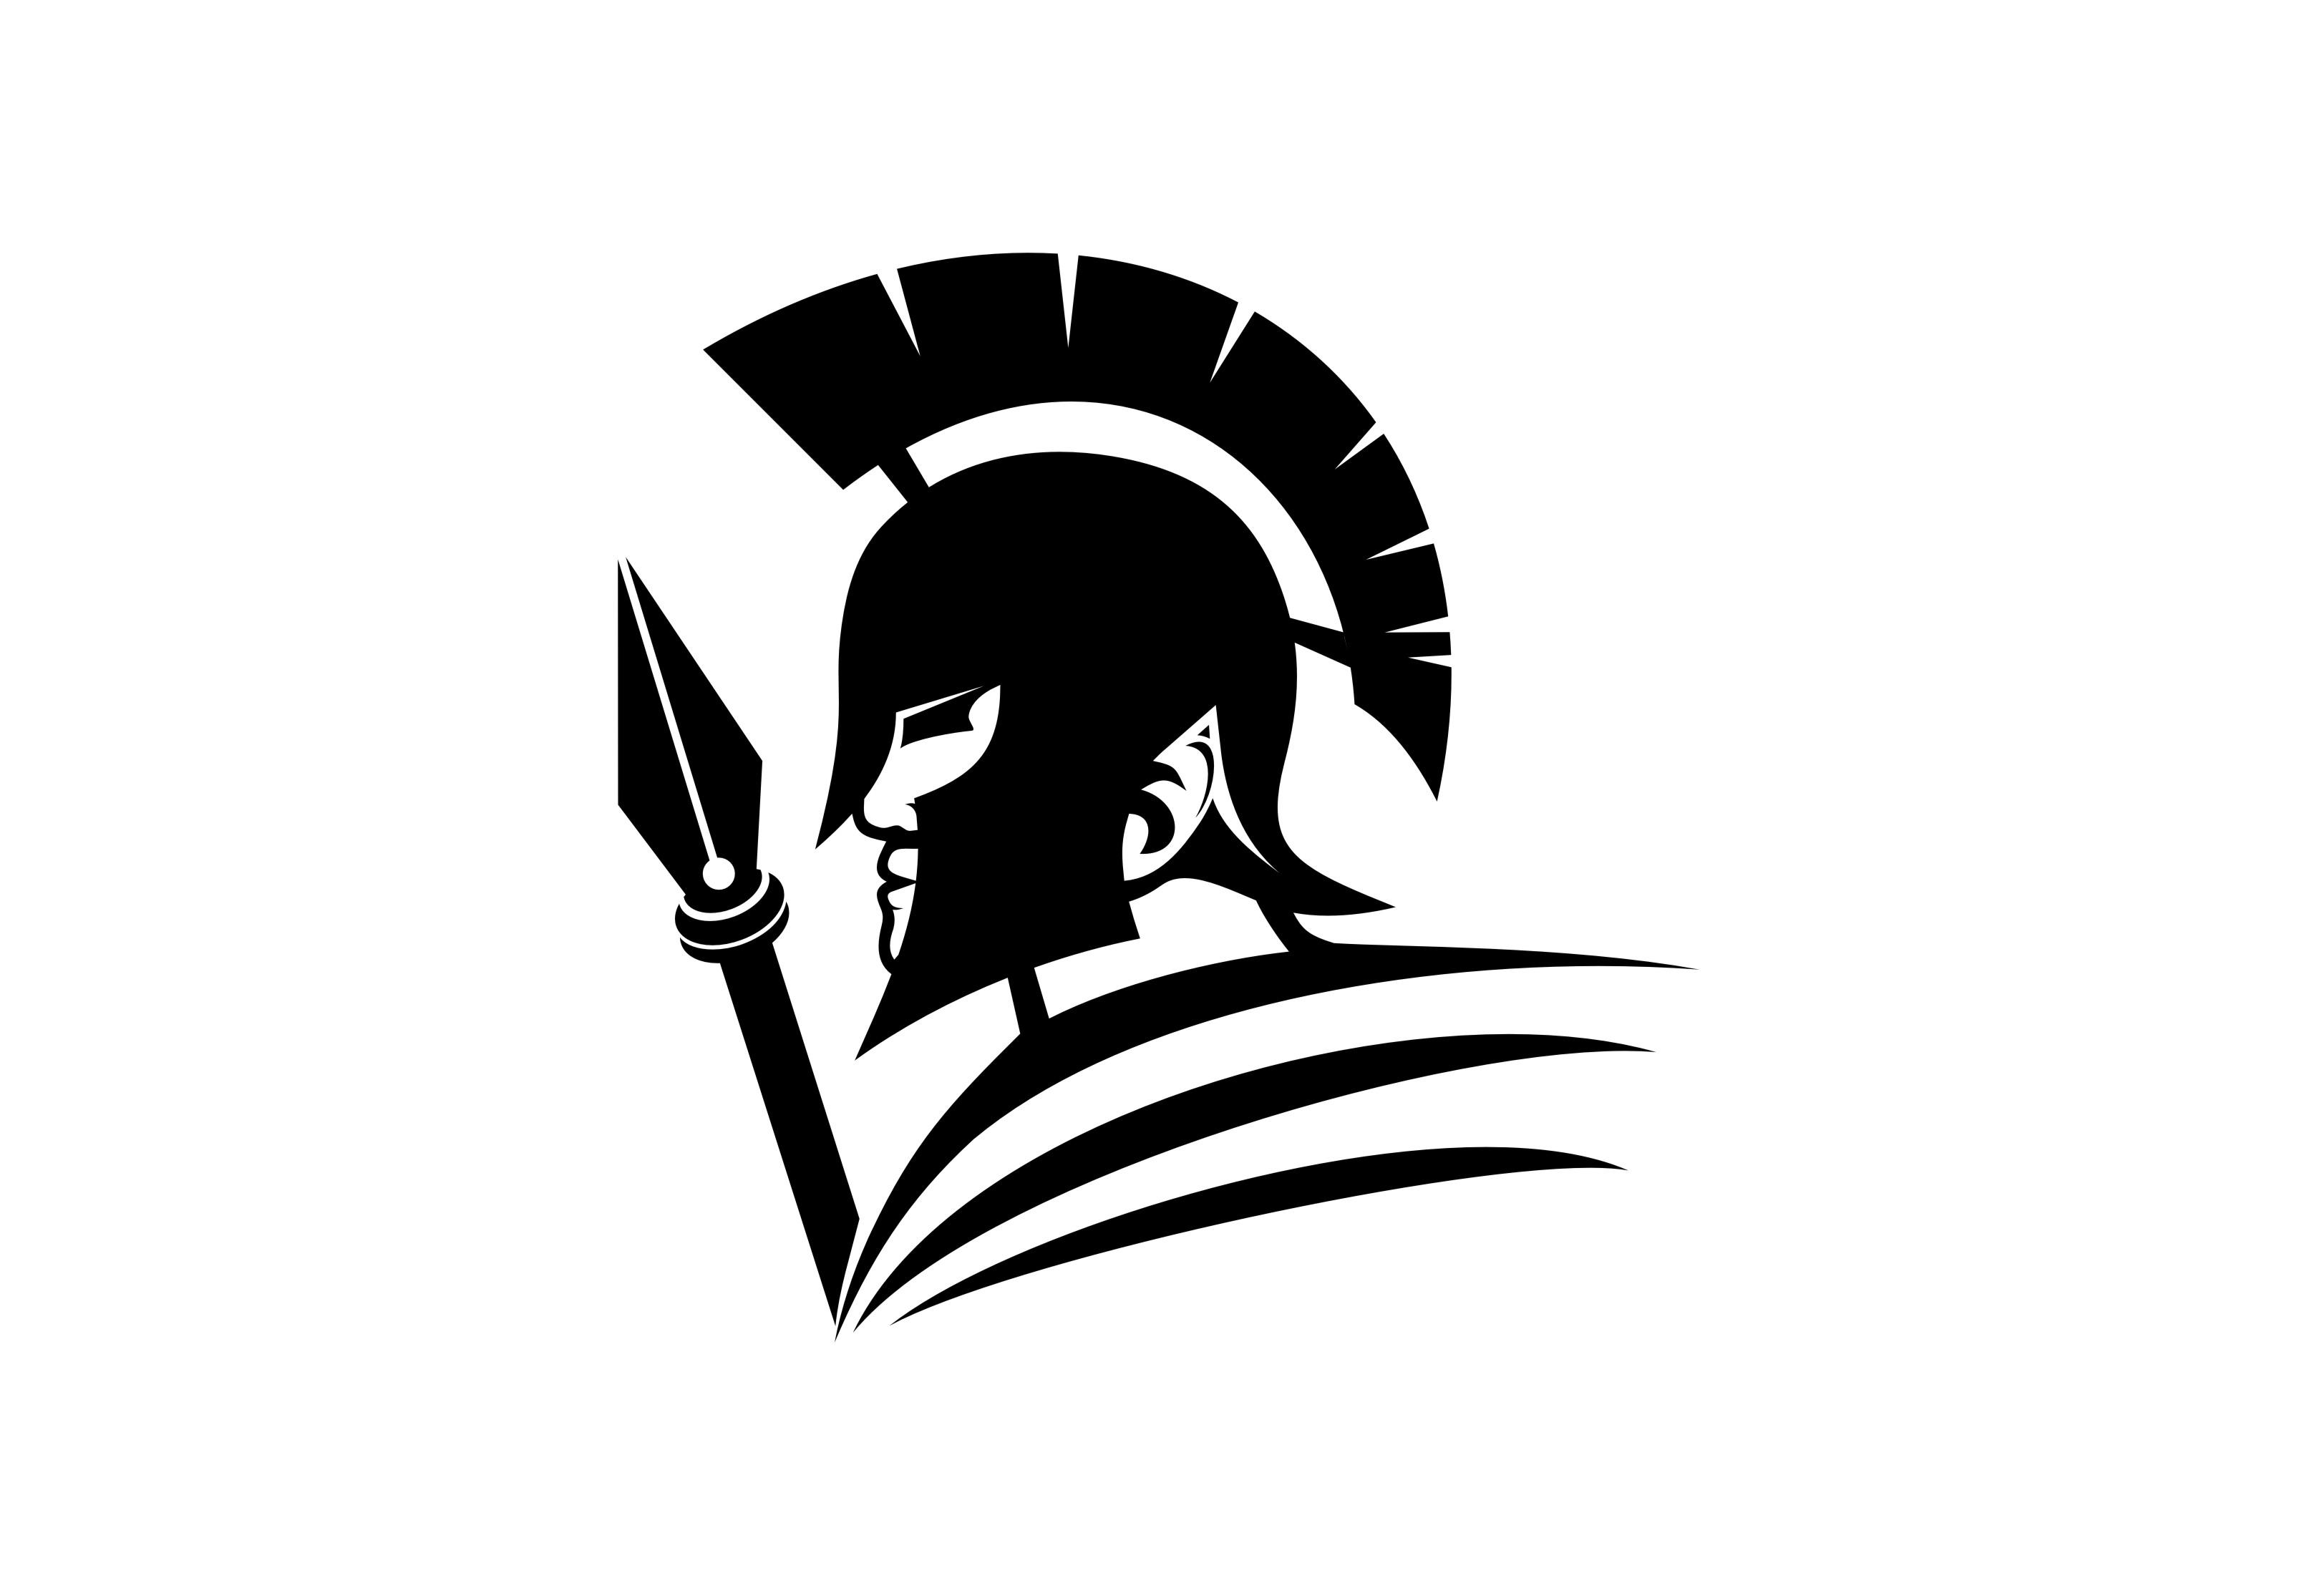 Spartan logo black